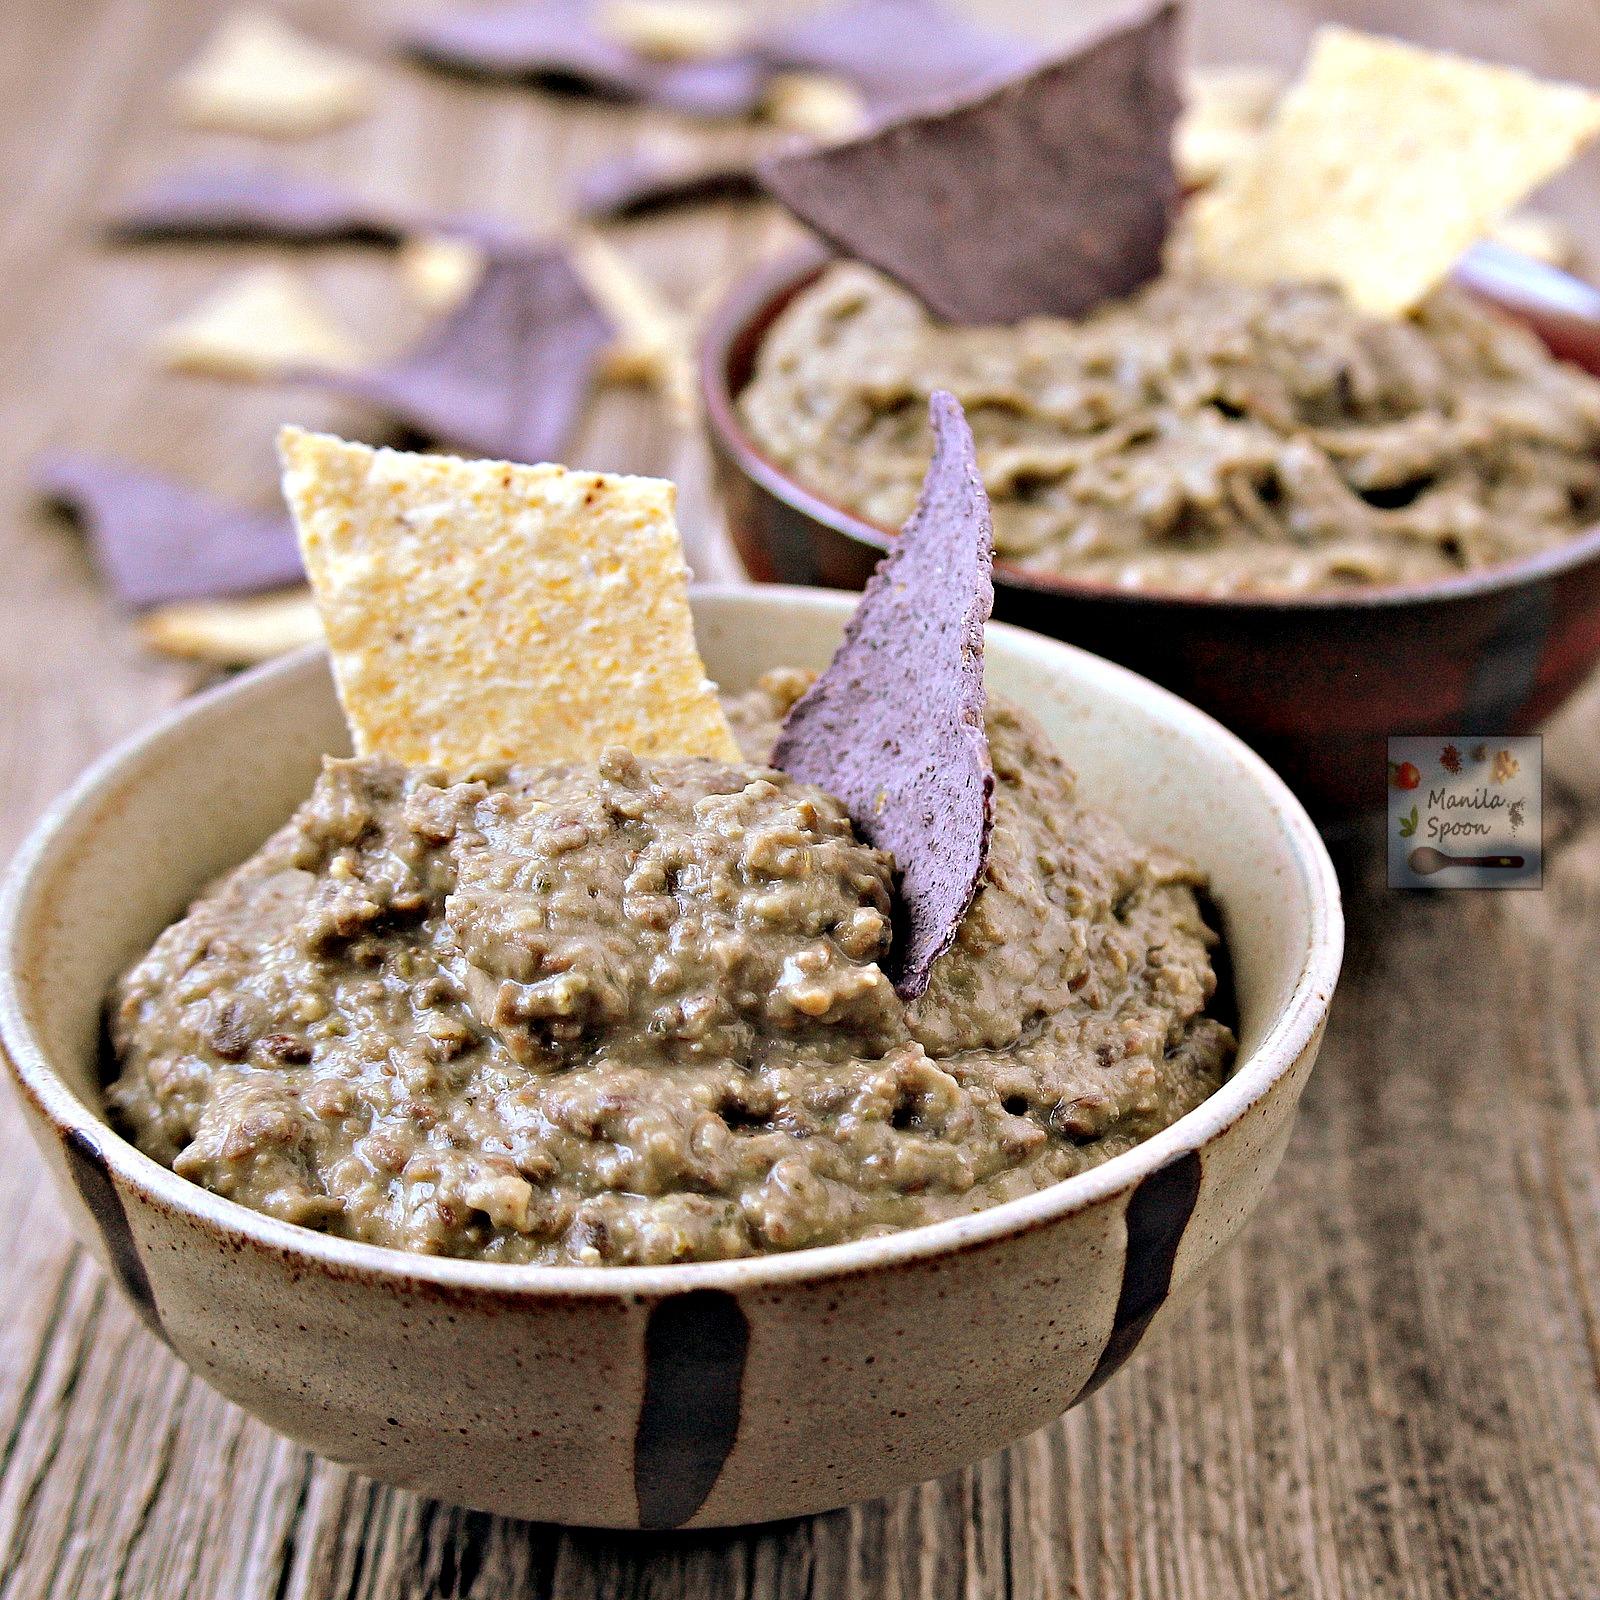 Easy 2 Ingredient Lentil and Cilantro Dip